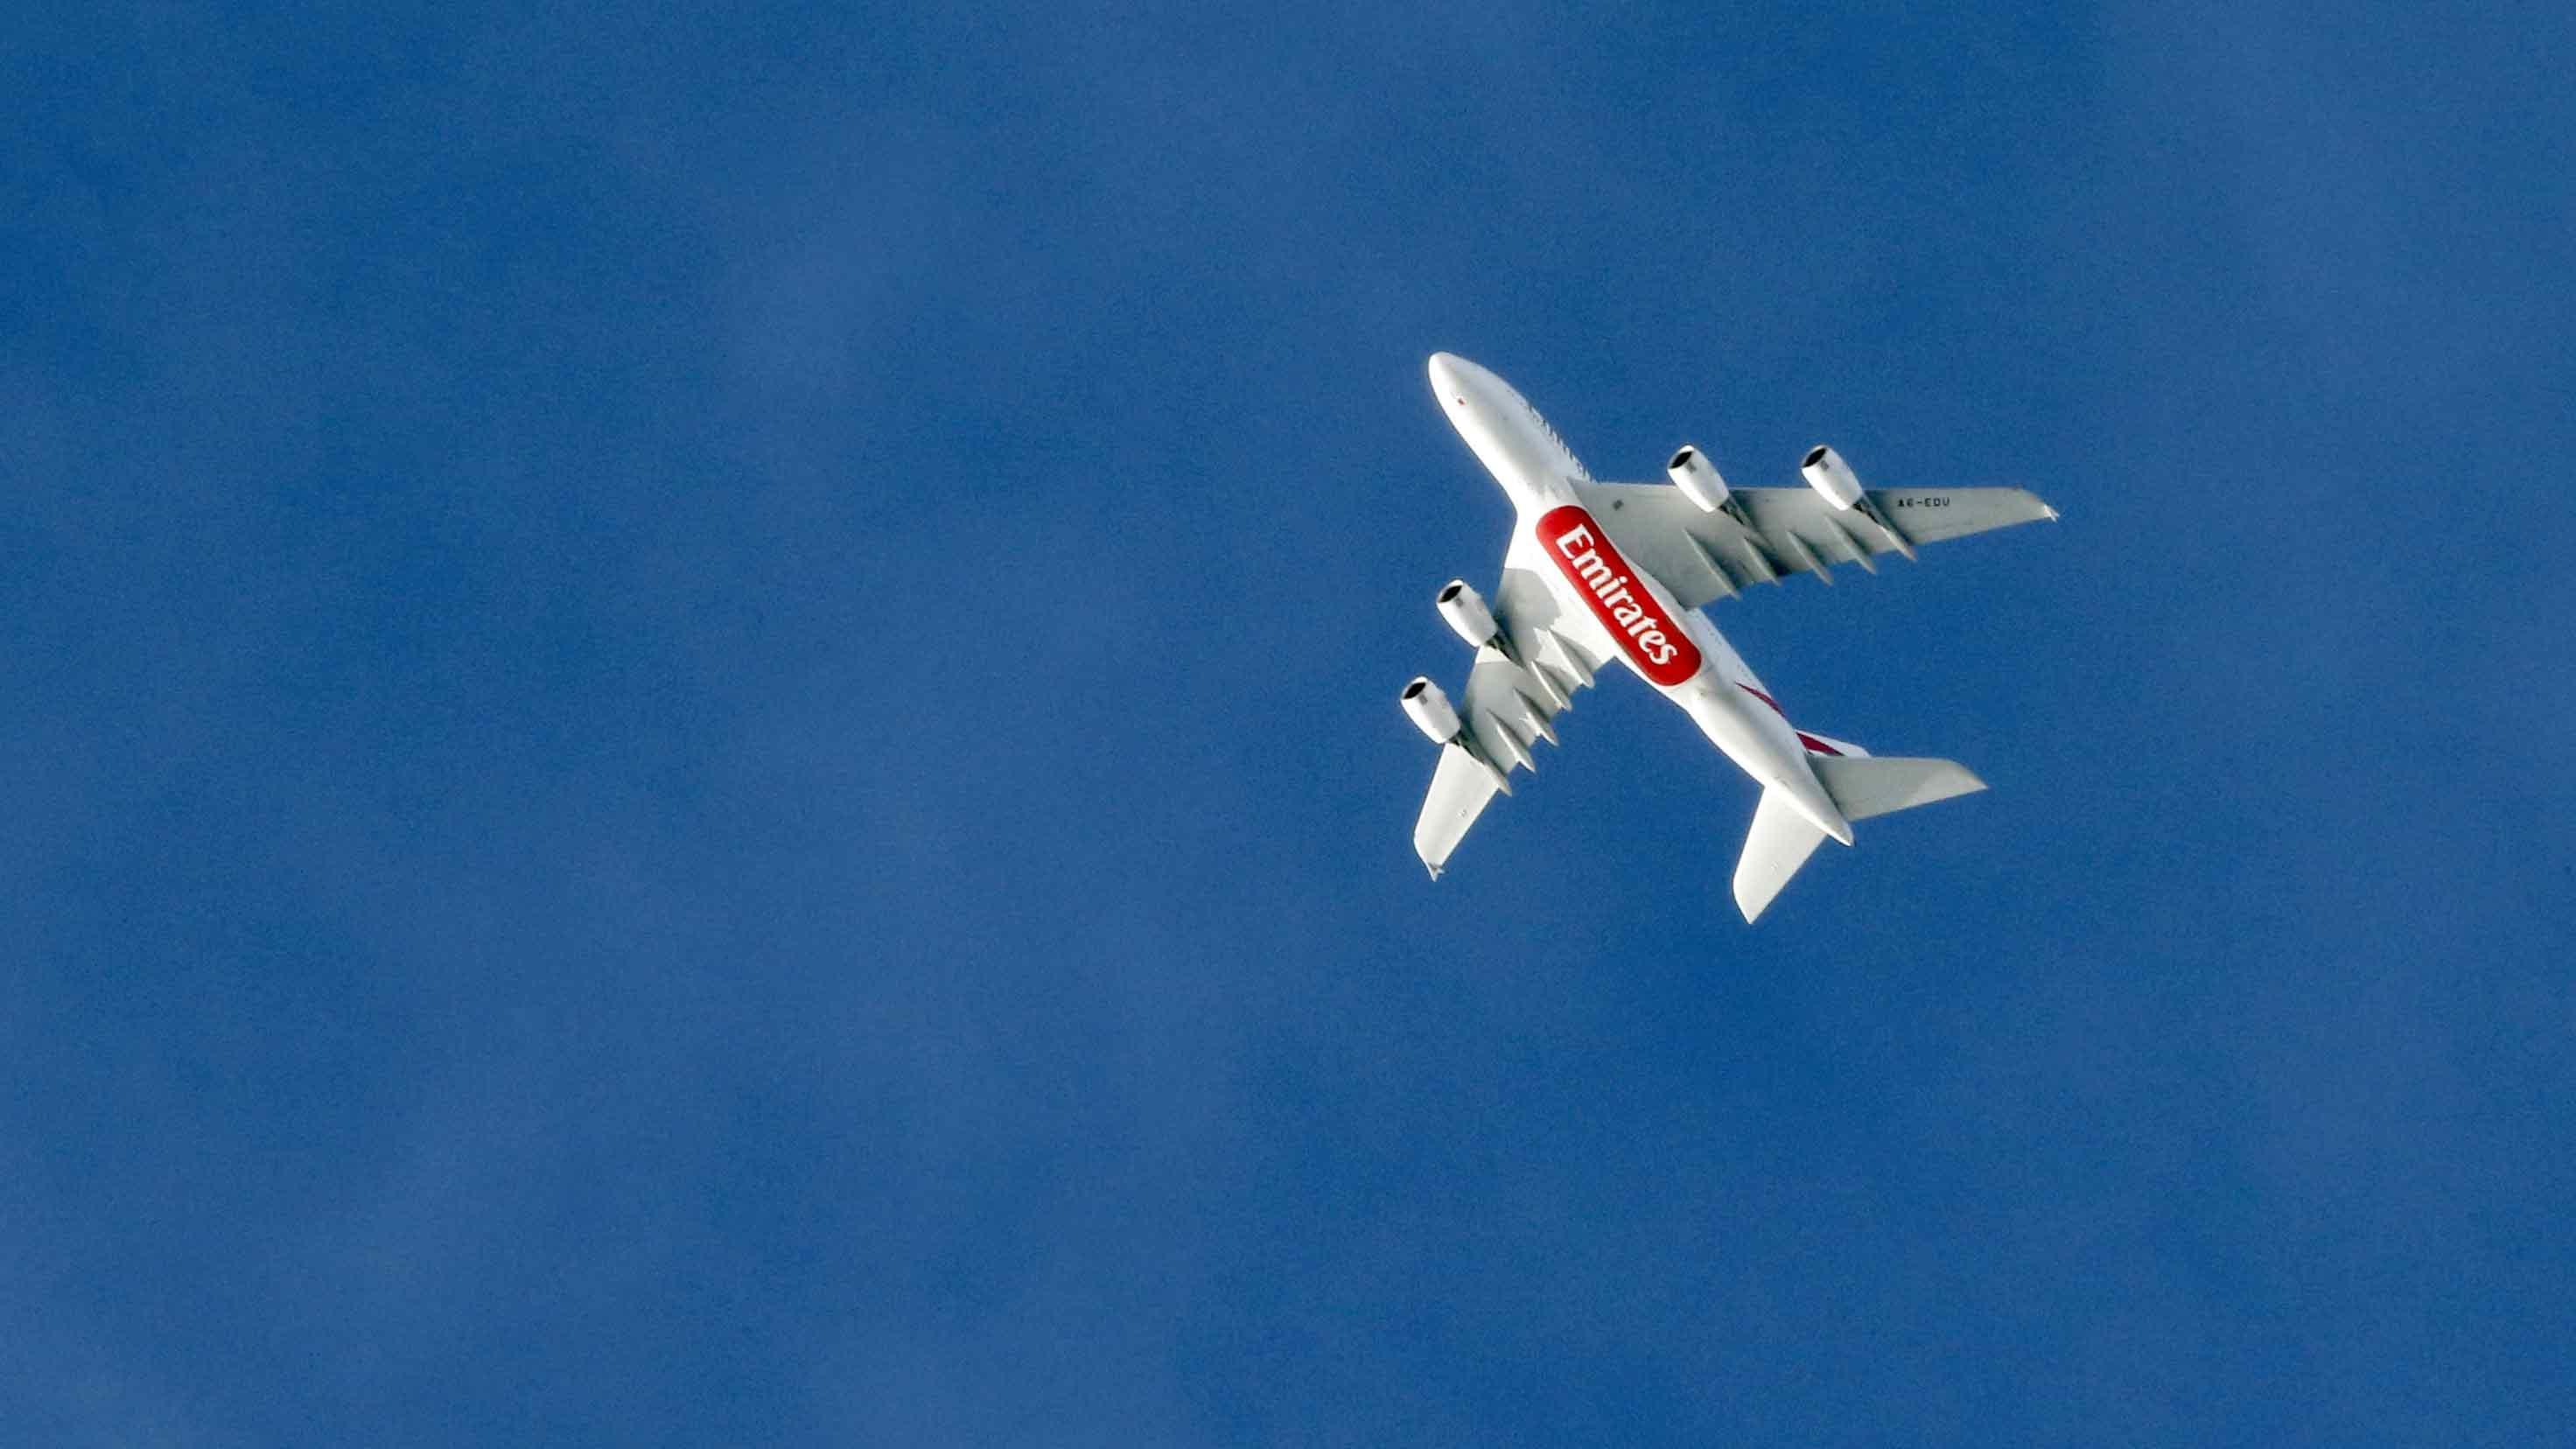 Emirates Airline Is Set To Launch Premium Economy